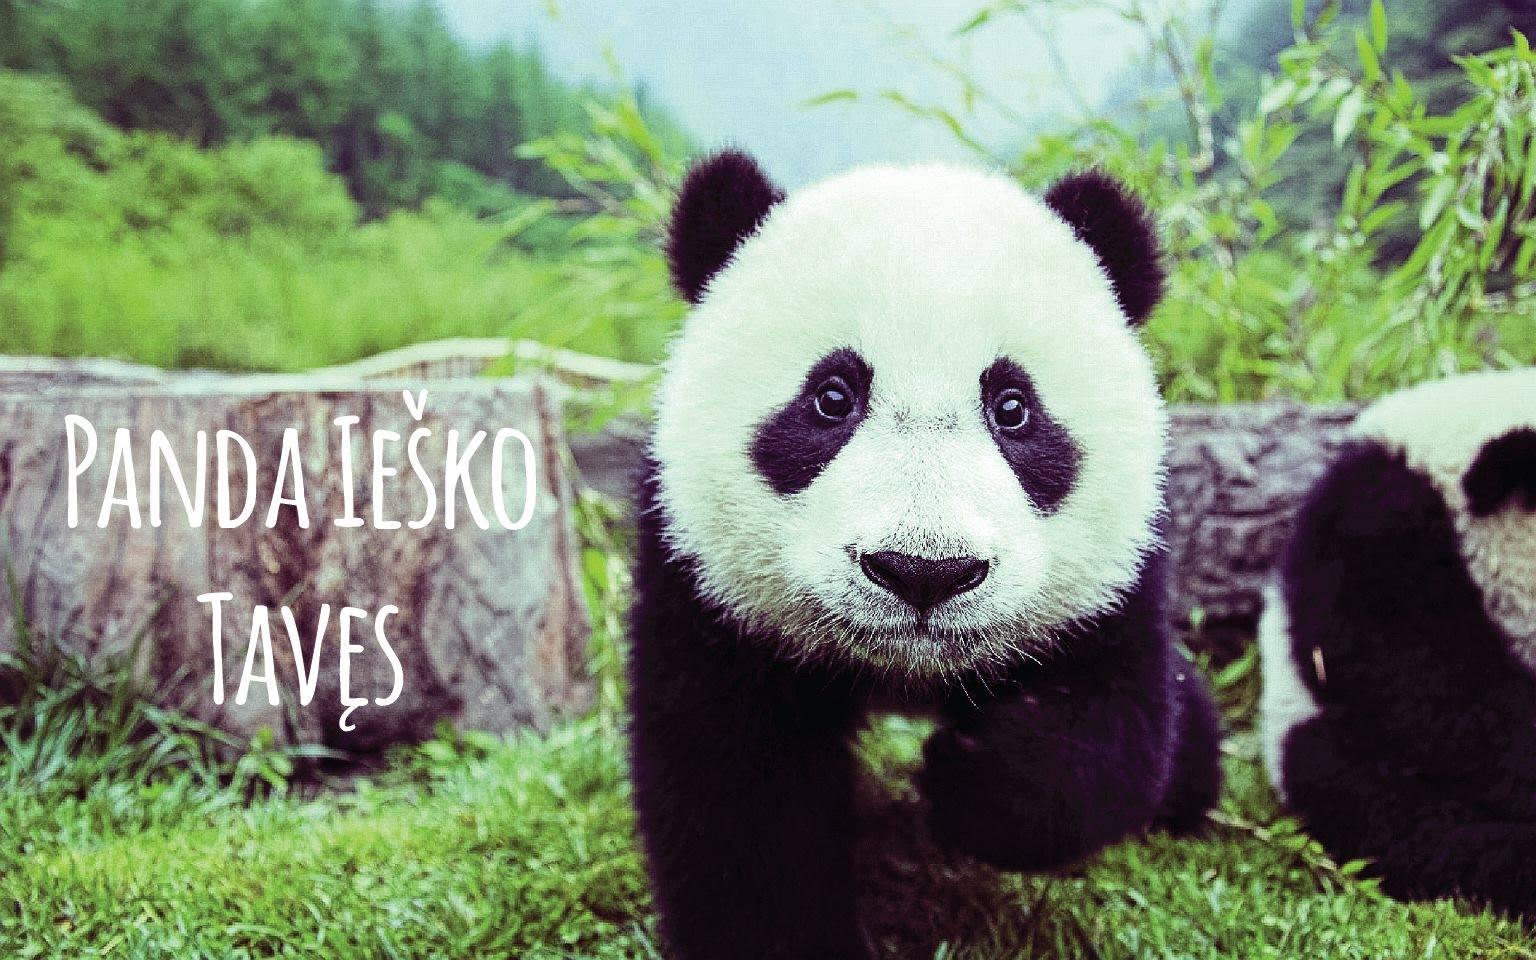 panda iesko